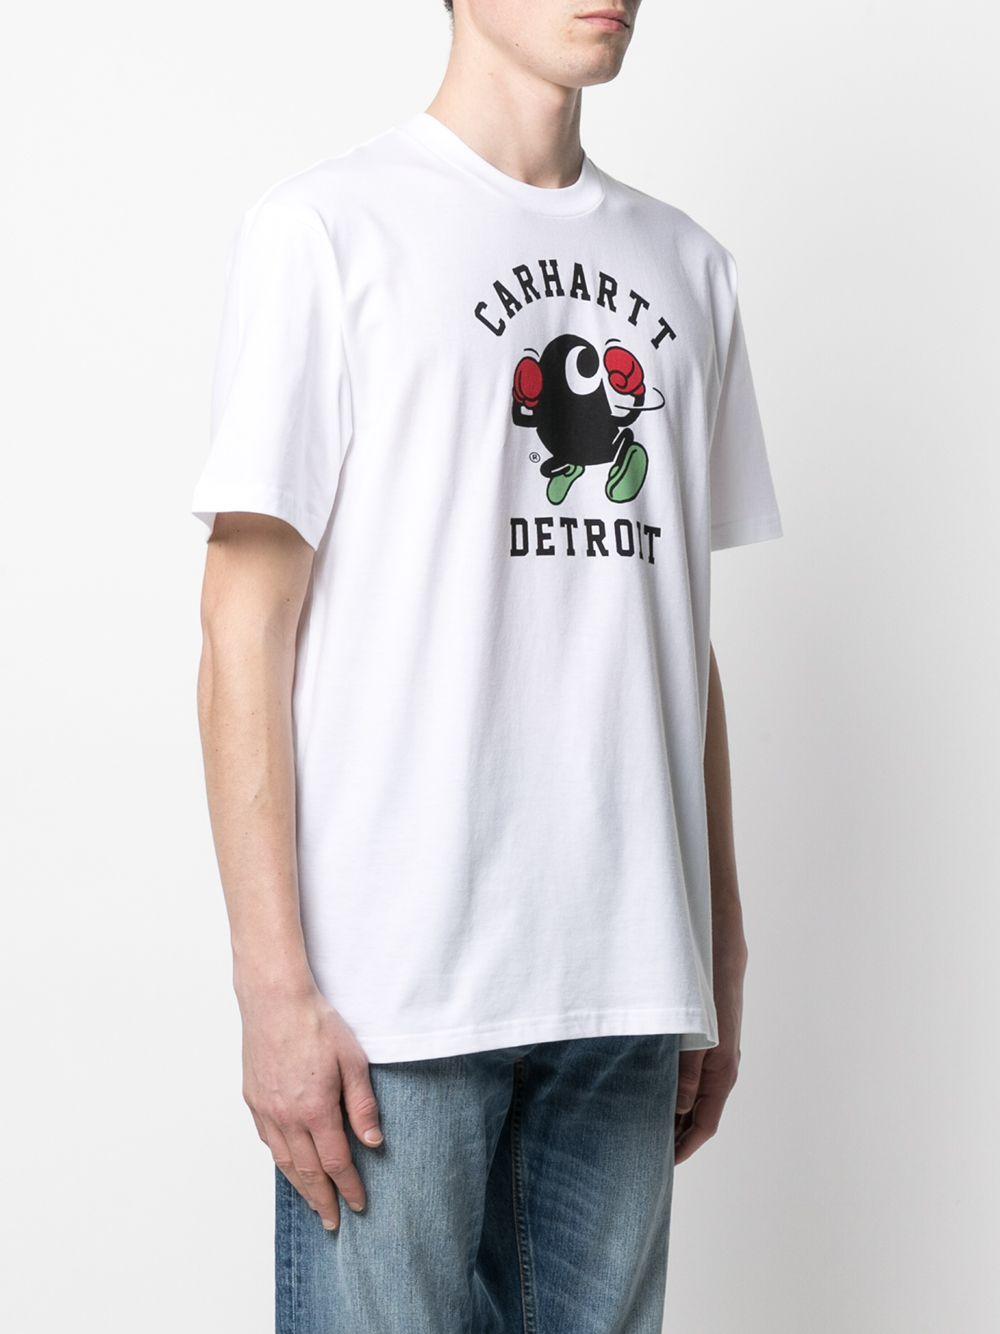 Carhartt carhartt boxing c t-shirt uomo CARHARTT | T-shirt | I02902602.00